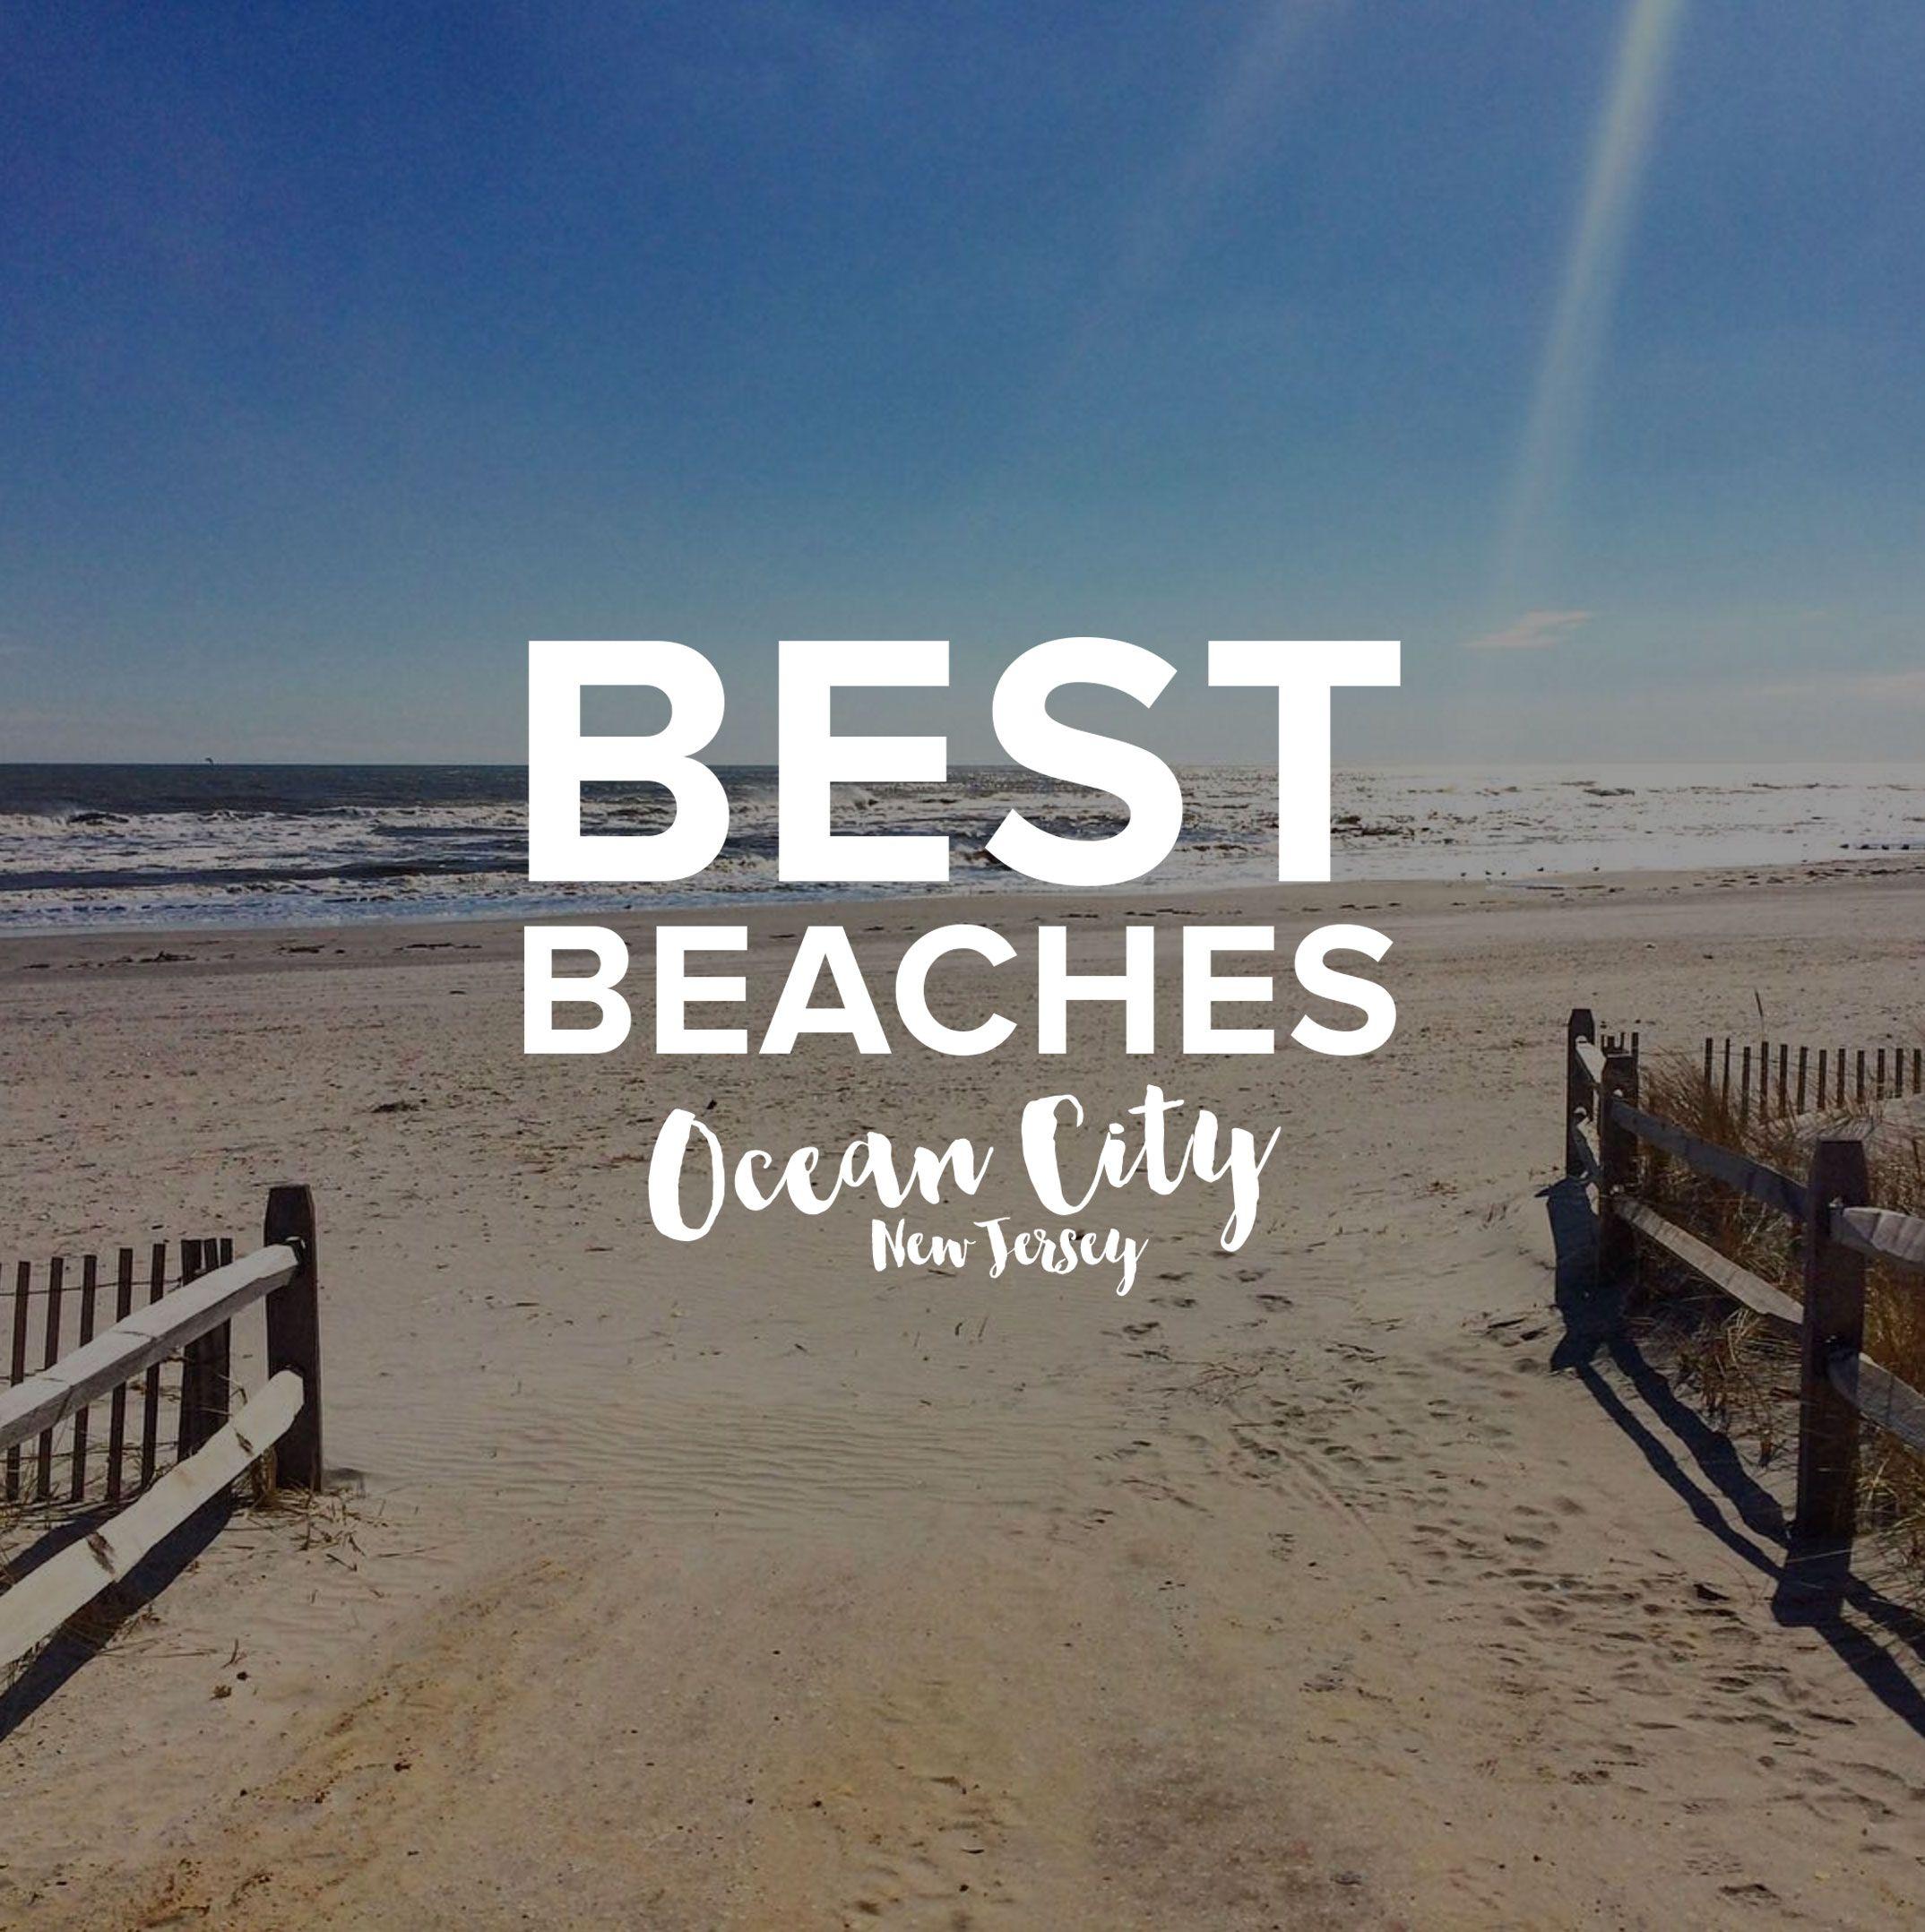 Top 10 Beaches In Ocean City Nj Ocean City Nj Ocean City Beach